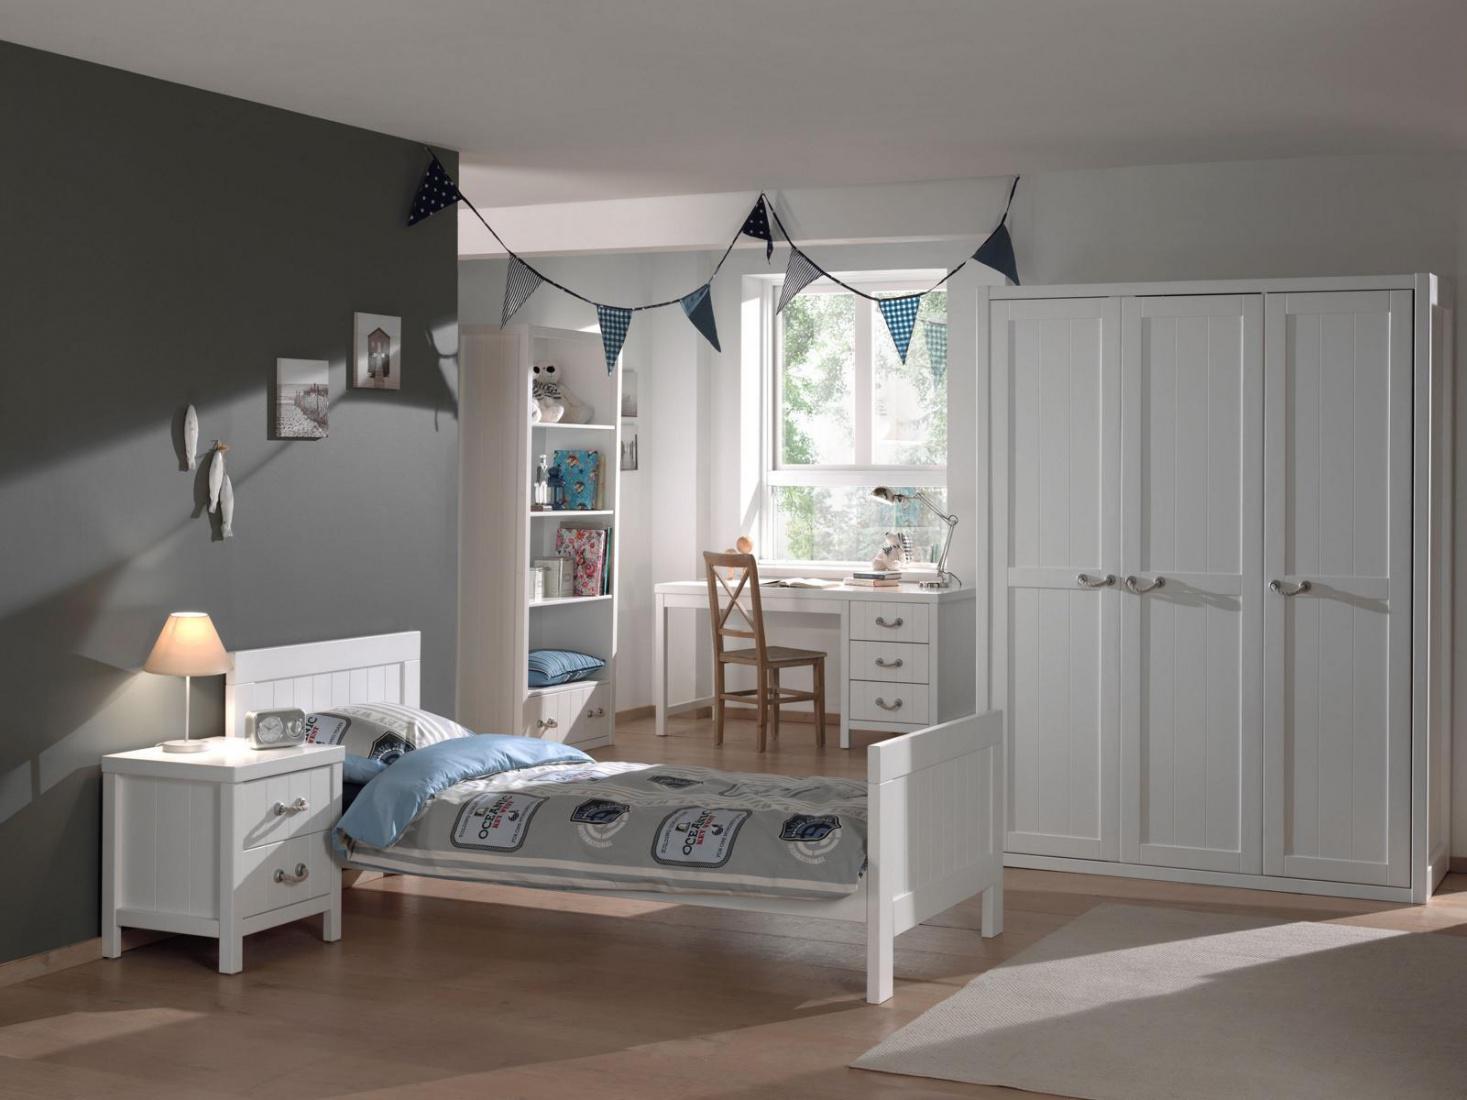 jugendzimmer set iny 5 teilig in wei mdf kaufen bei m bel lux. Black Bedroom Furniture Sets. Home Design Ideas